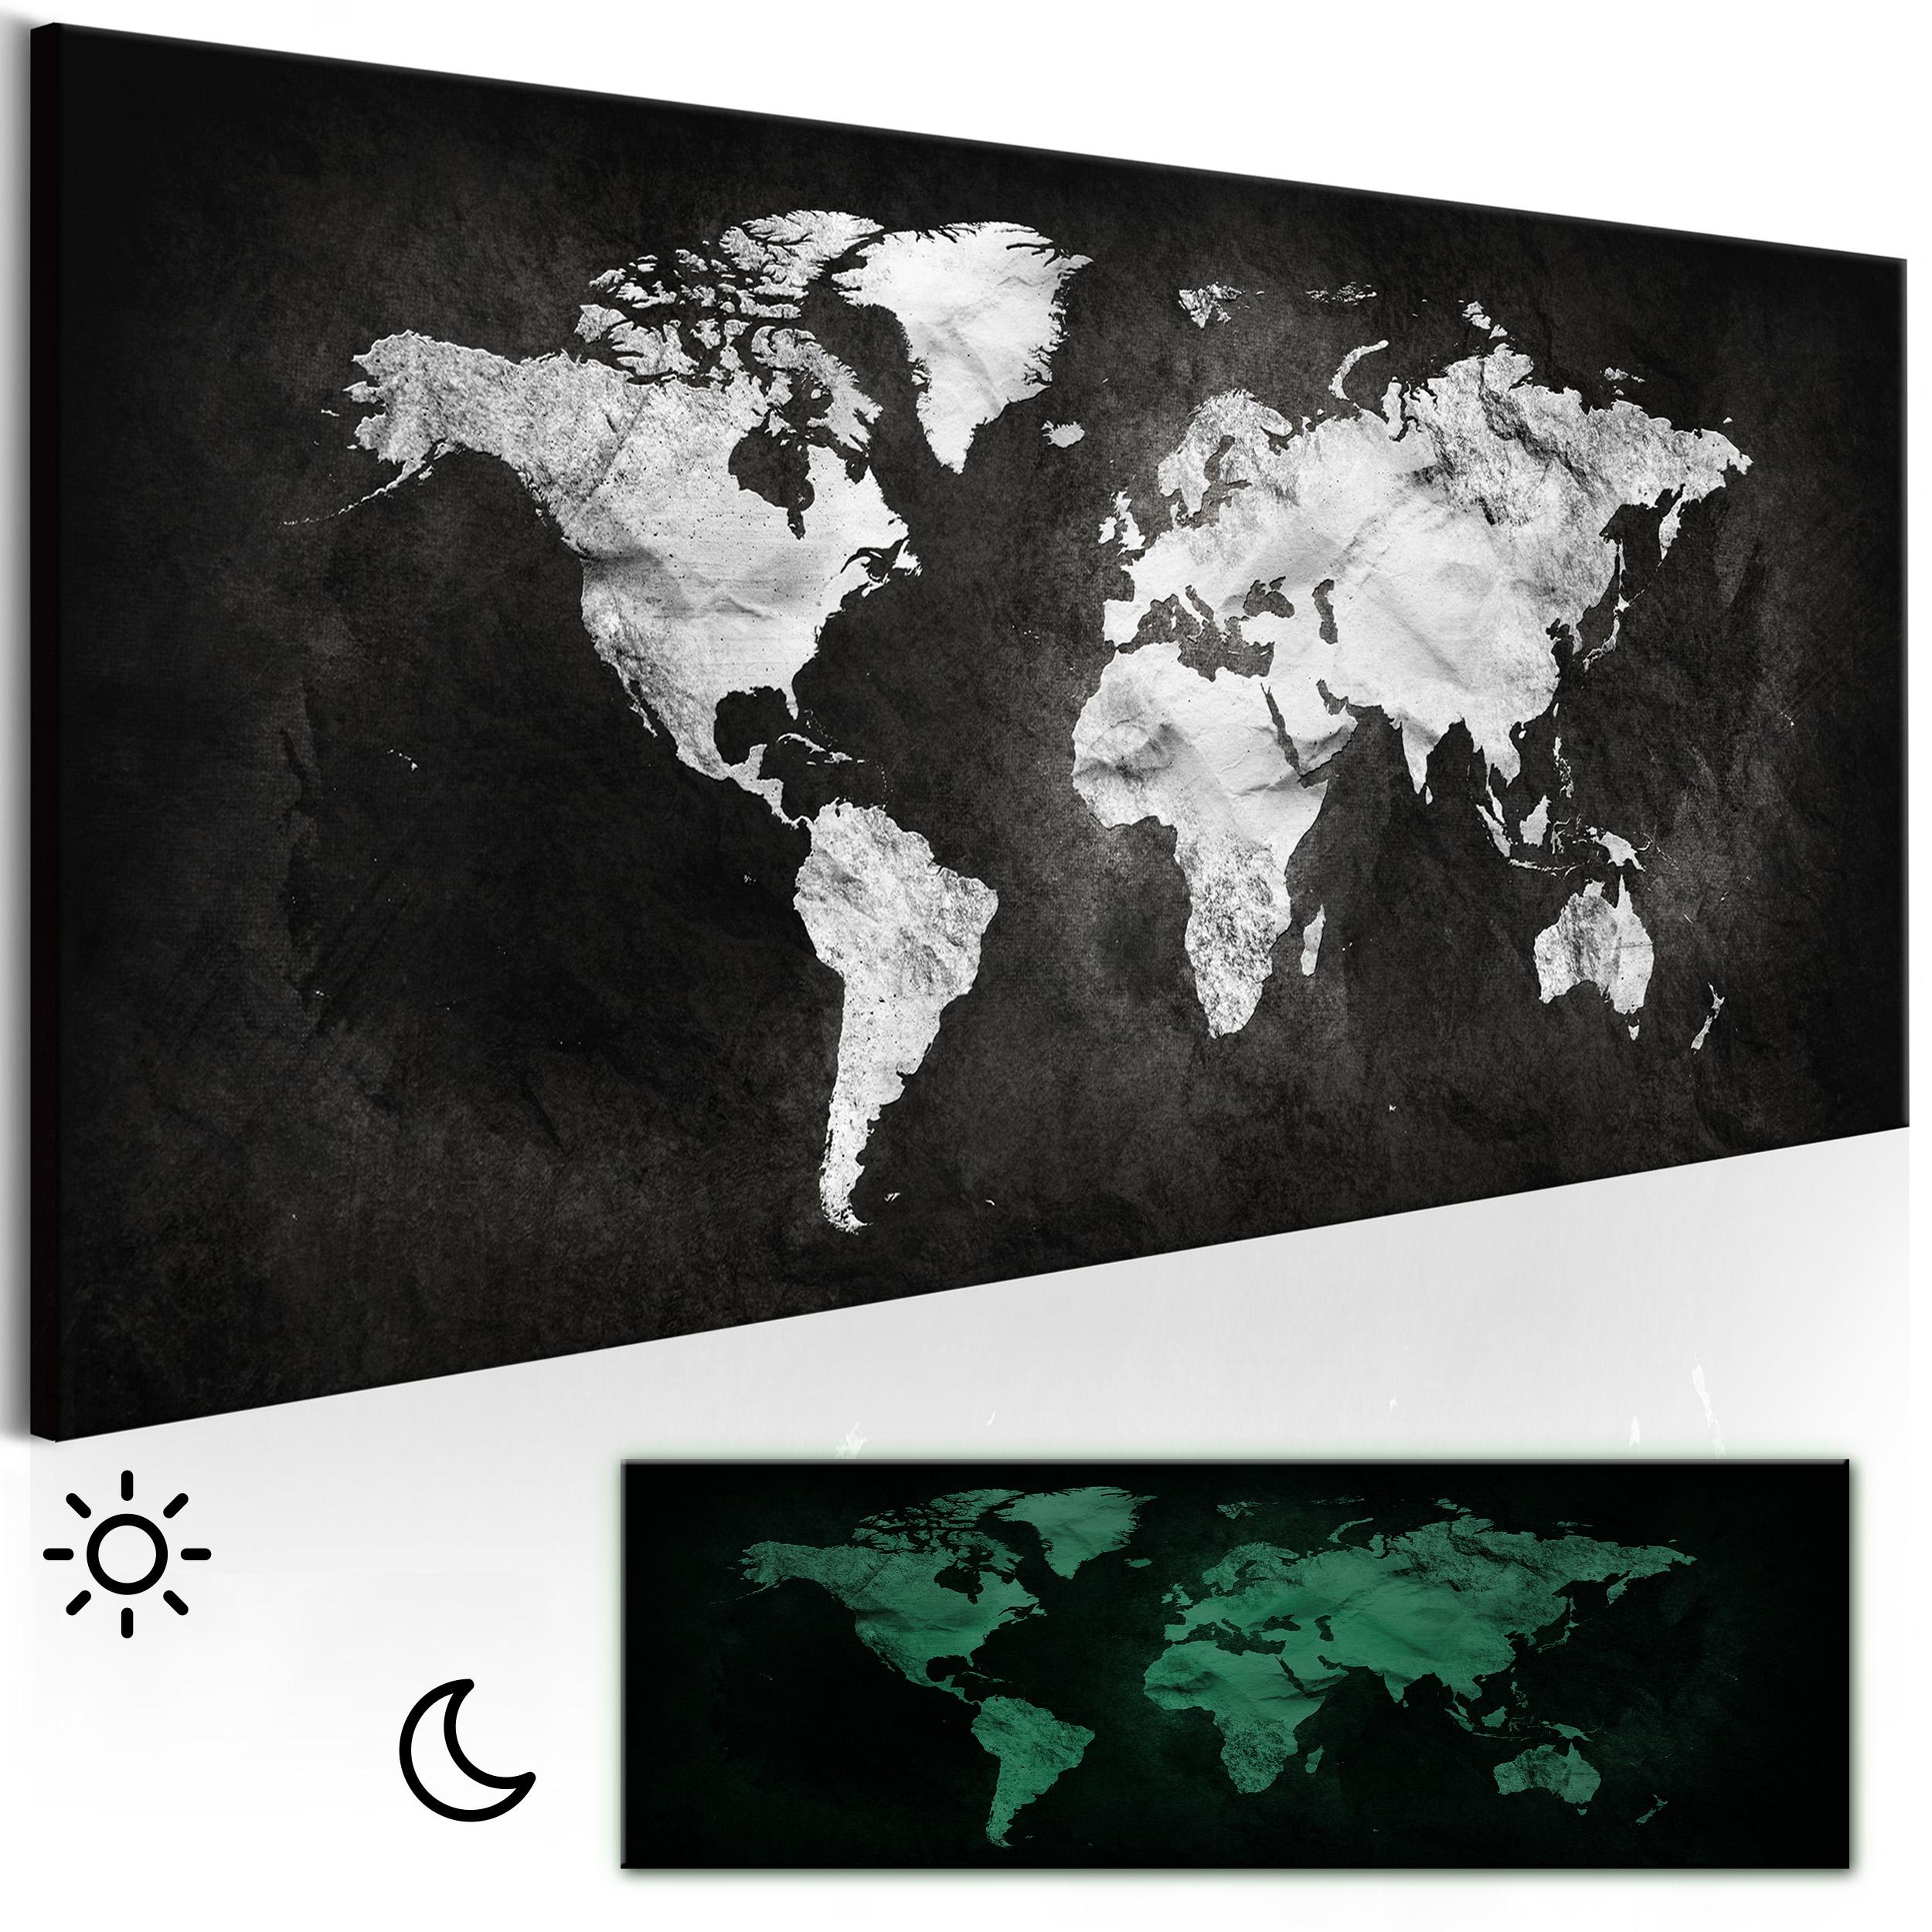 leinwand bilder weltkarte schwarz wei wandbilder xxl. Black Bedroom Furniture Sets. Home Design Ideas